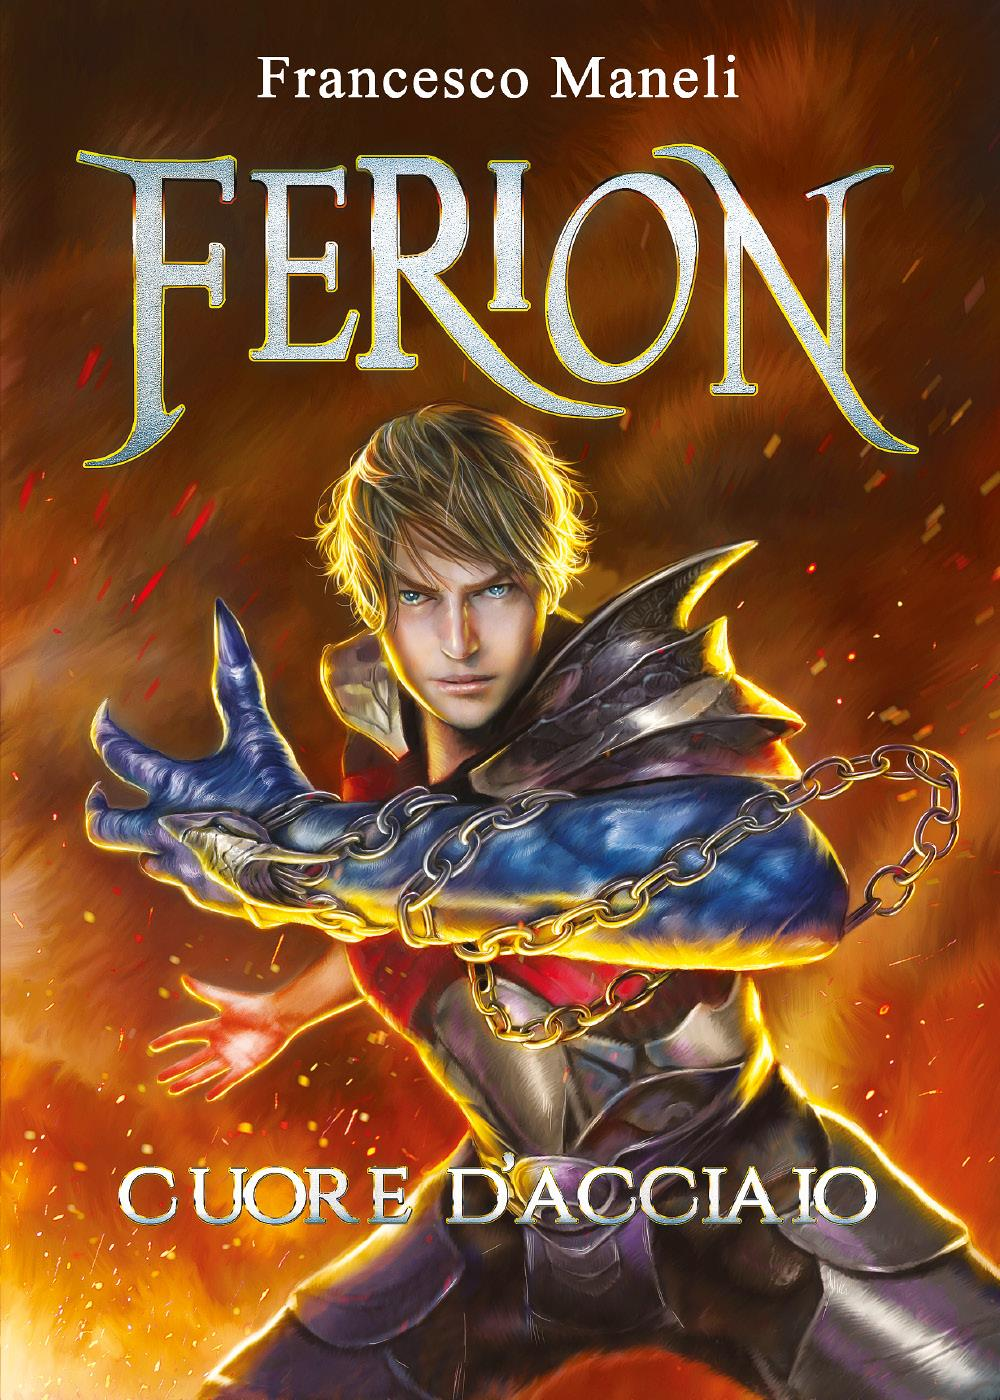 Ferion, cuore d'acciaio